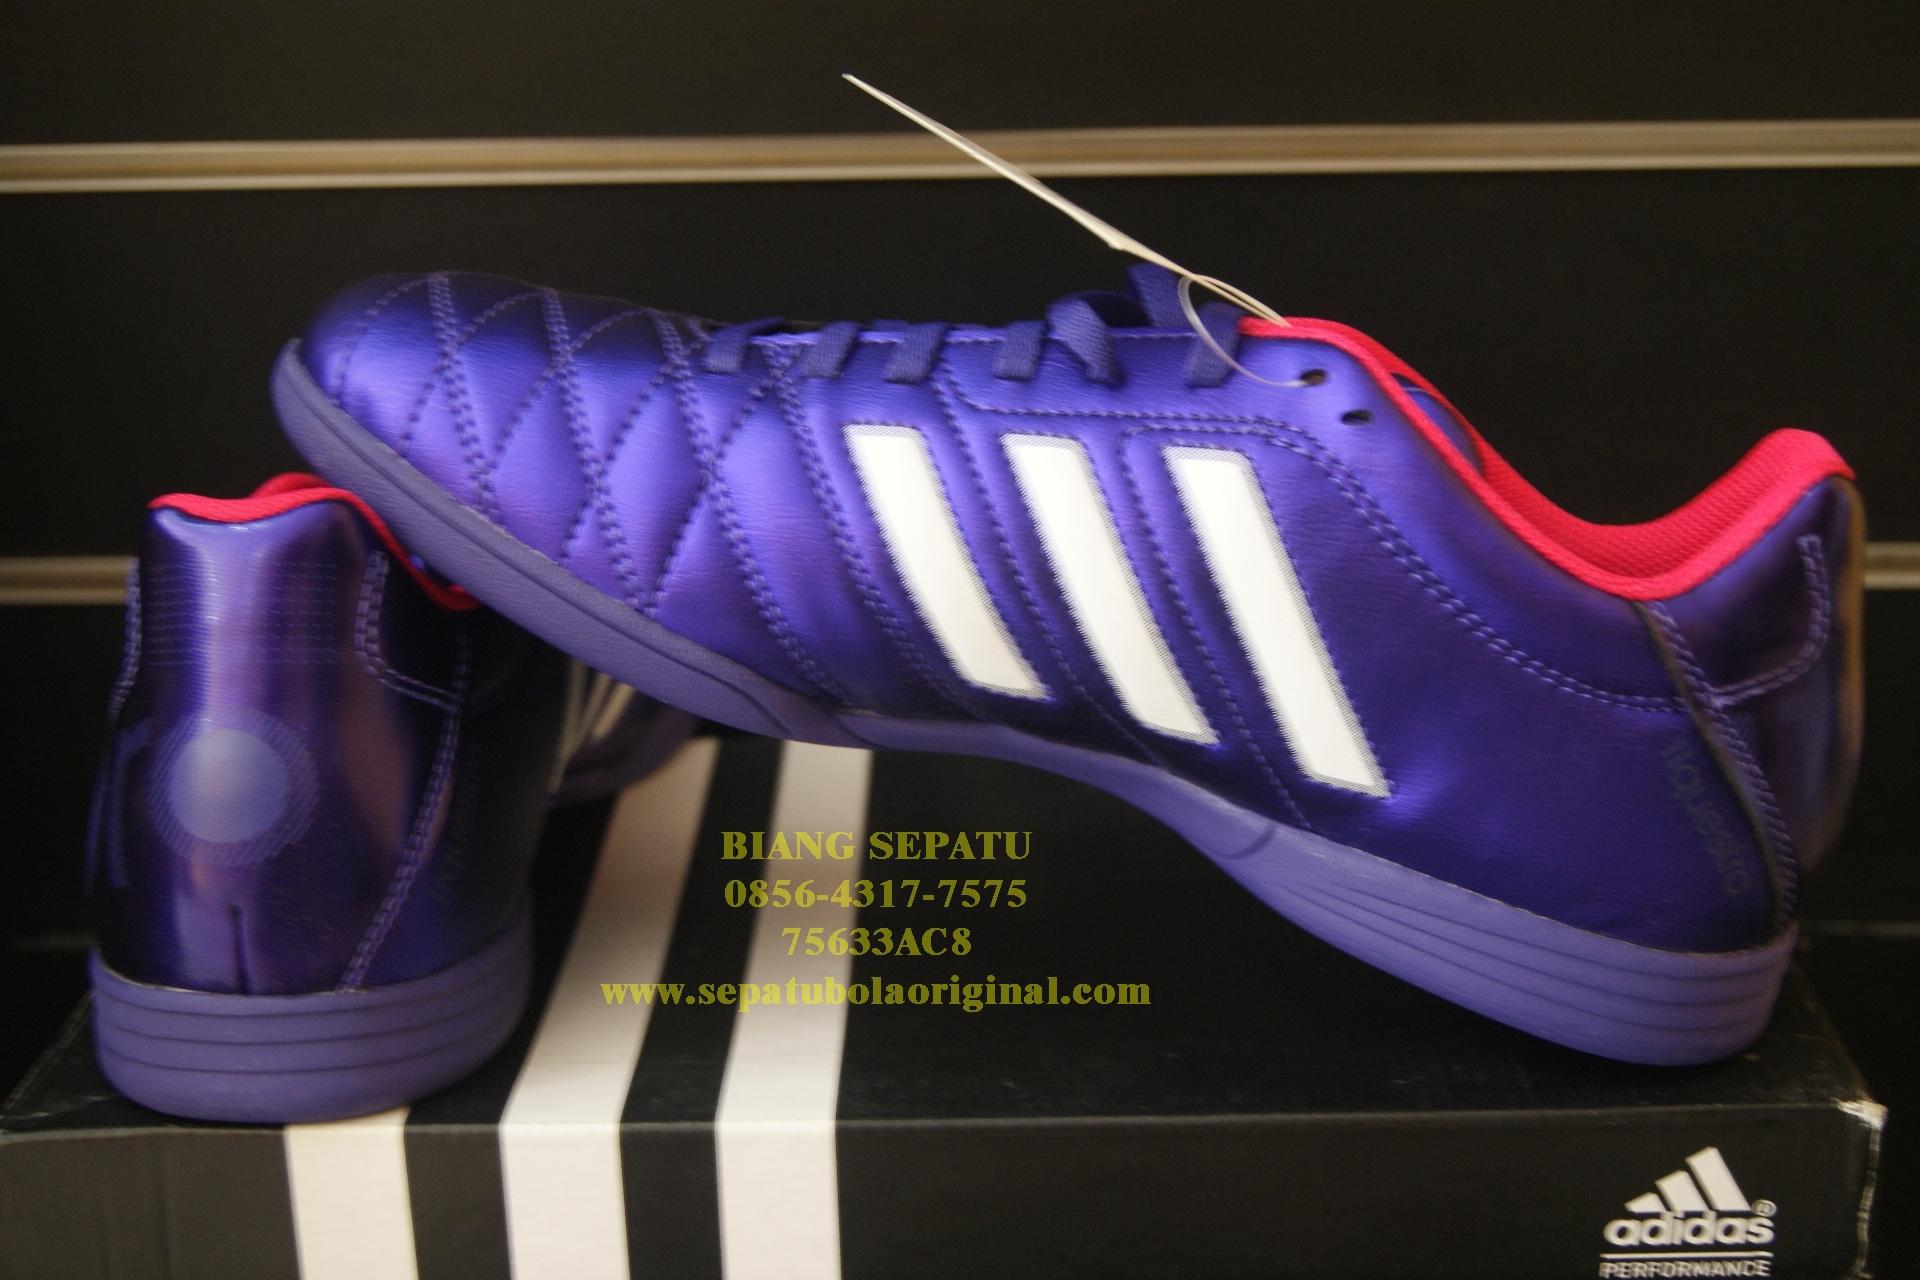 ... terbaru f2d57 c7ea2  closeout daftar harga sepatu adidas original 2014  . 2856e ed101 6426140521